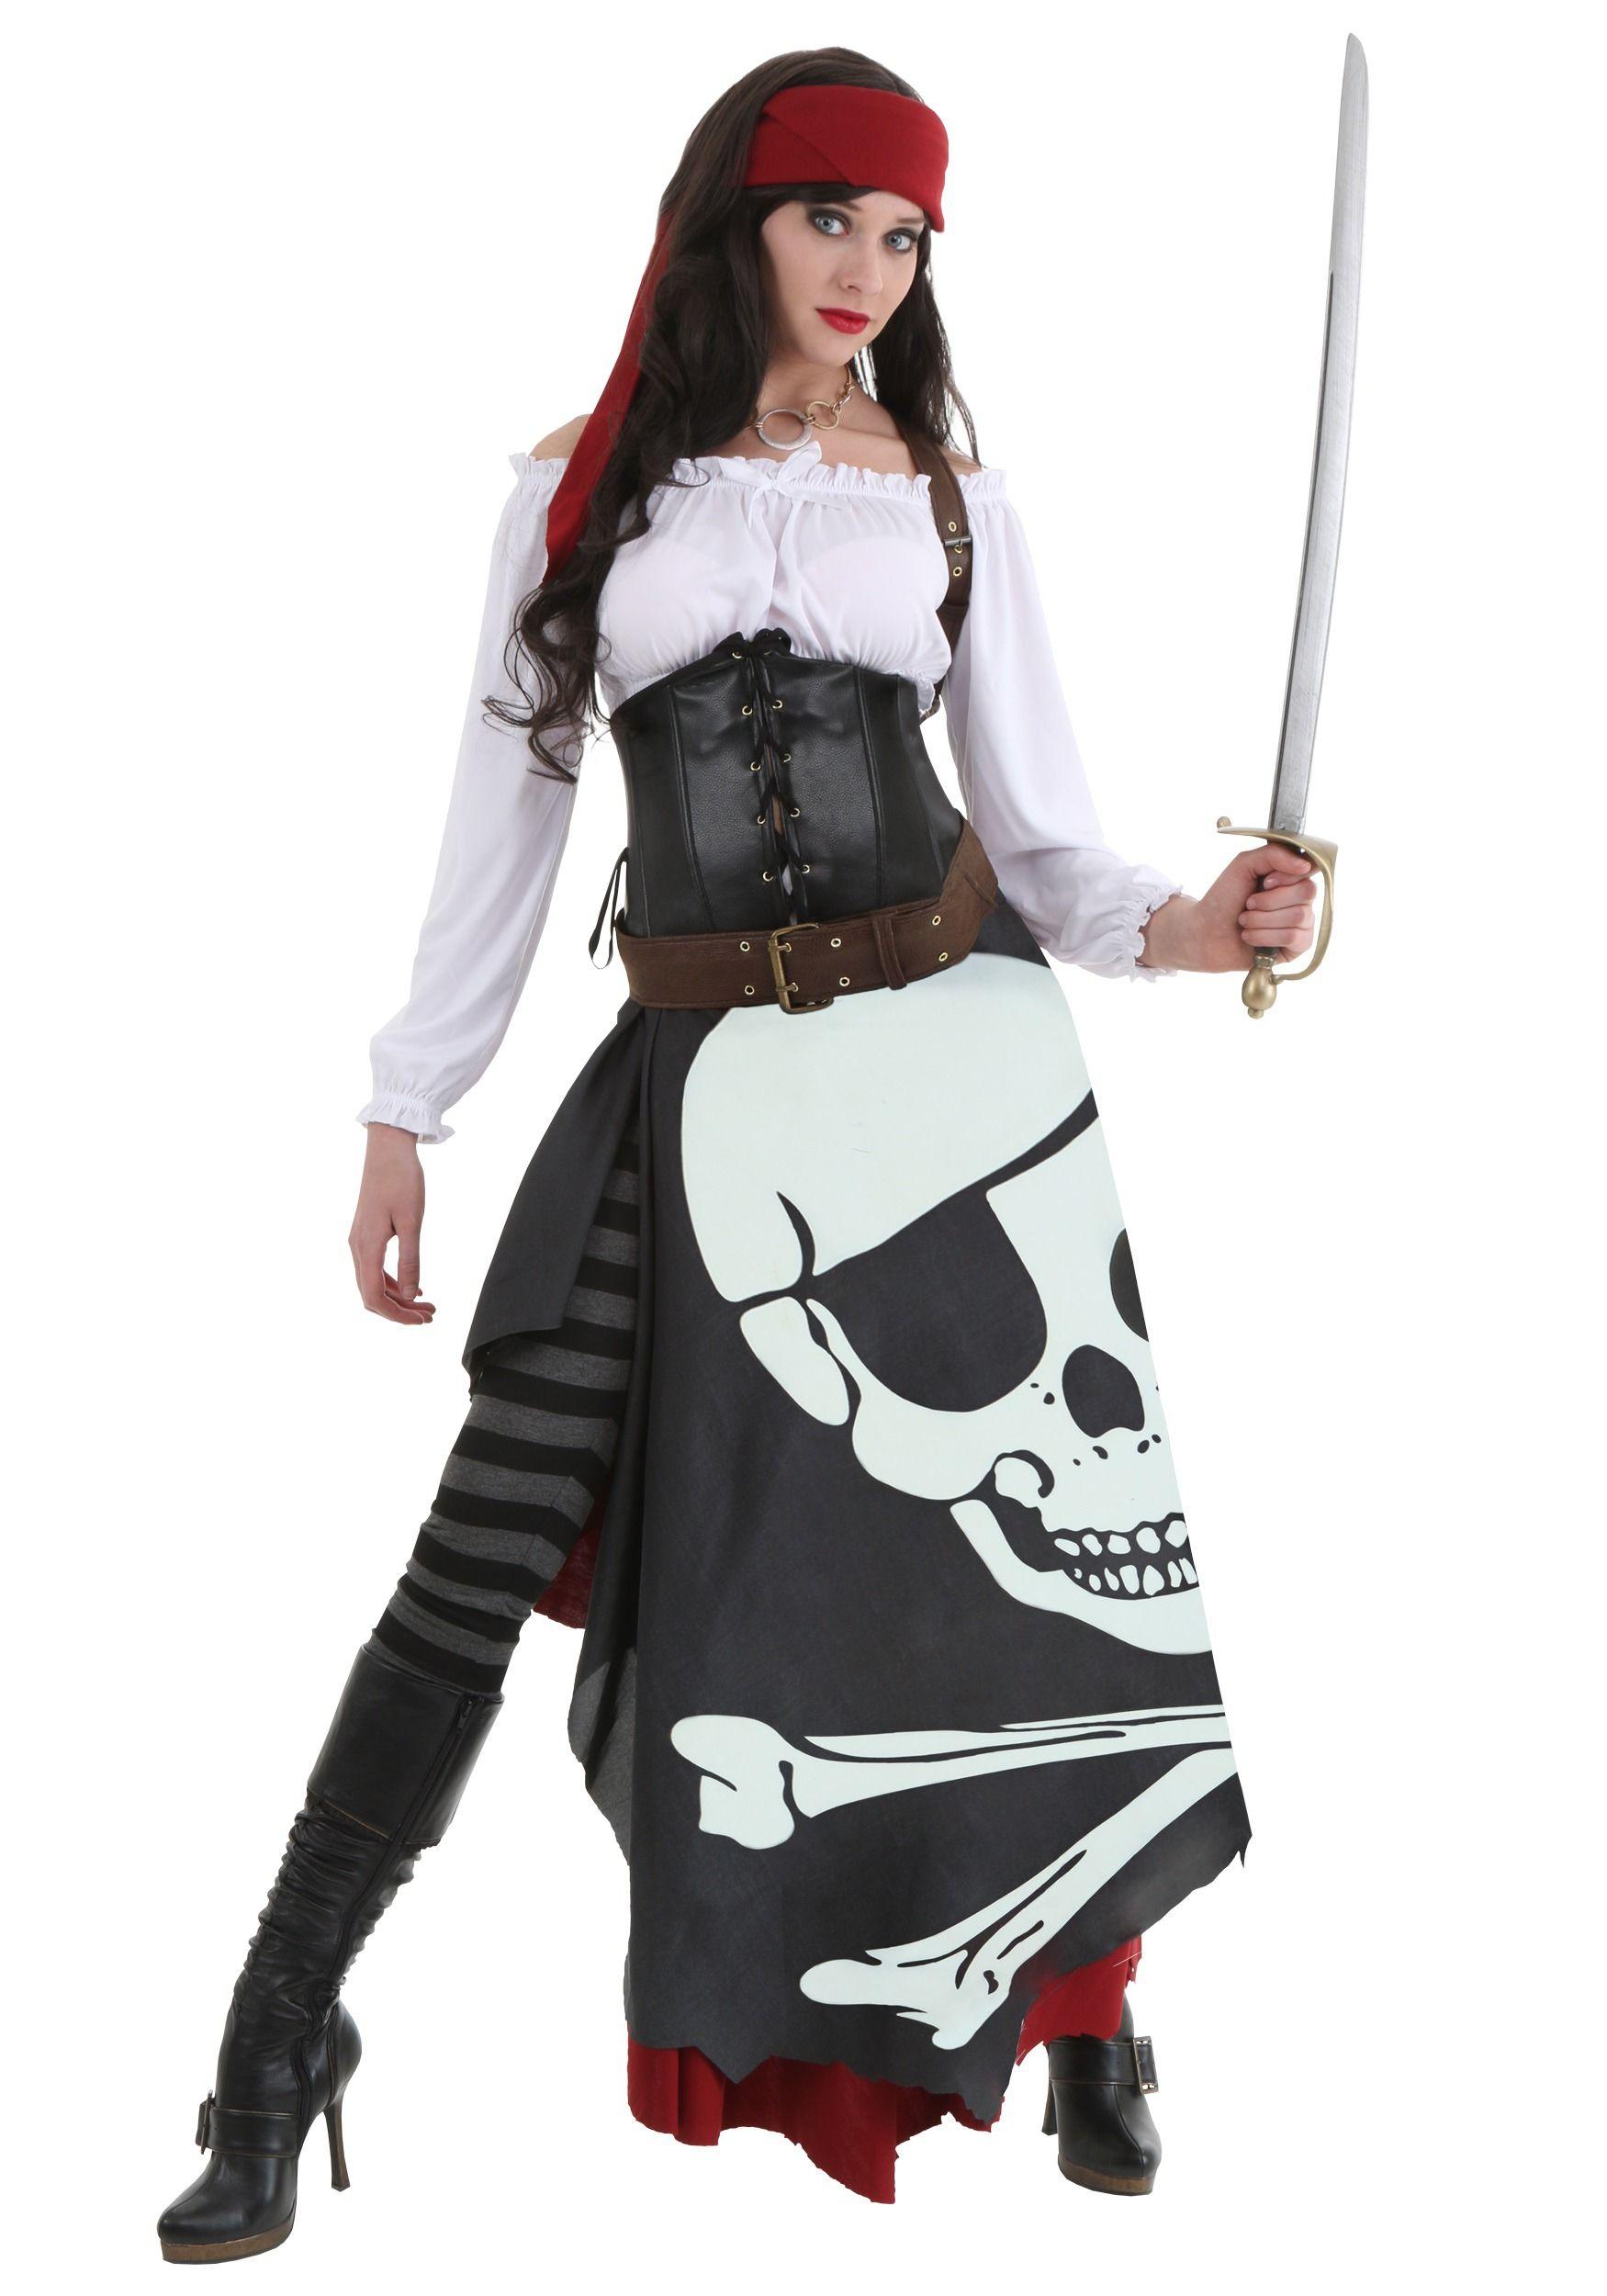 Women s Pirate Flag Gypsy Costume Too cute I need to make that